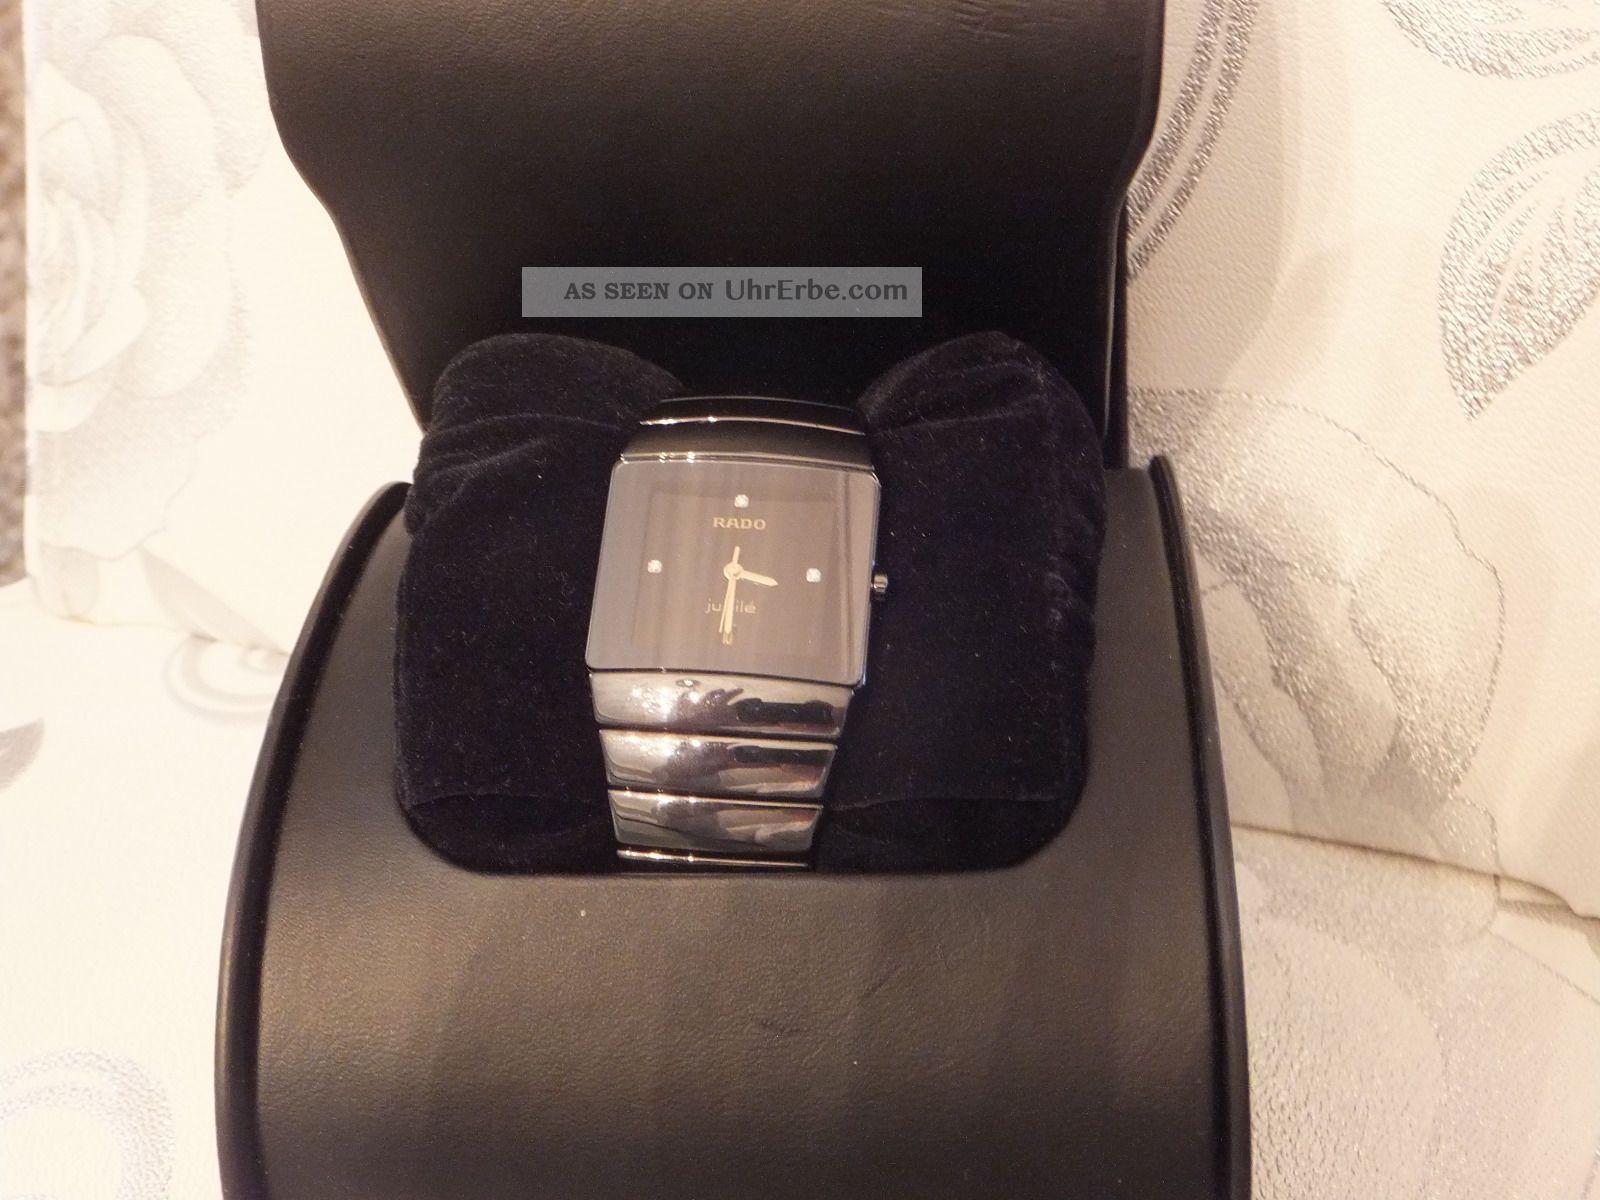 Rado Sintra Sintra Jubile Armbanduhr Für Herren Oder Damen Größe Midi Neuwertig Armbanduhren Bild